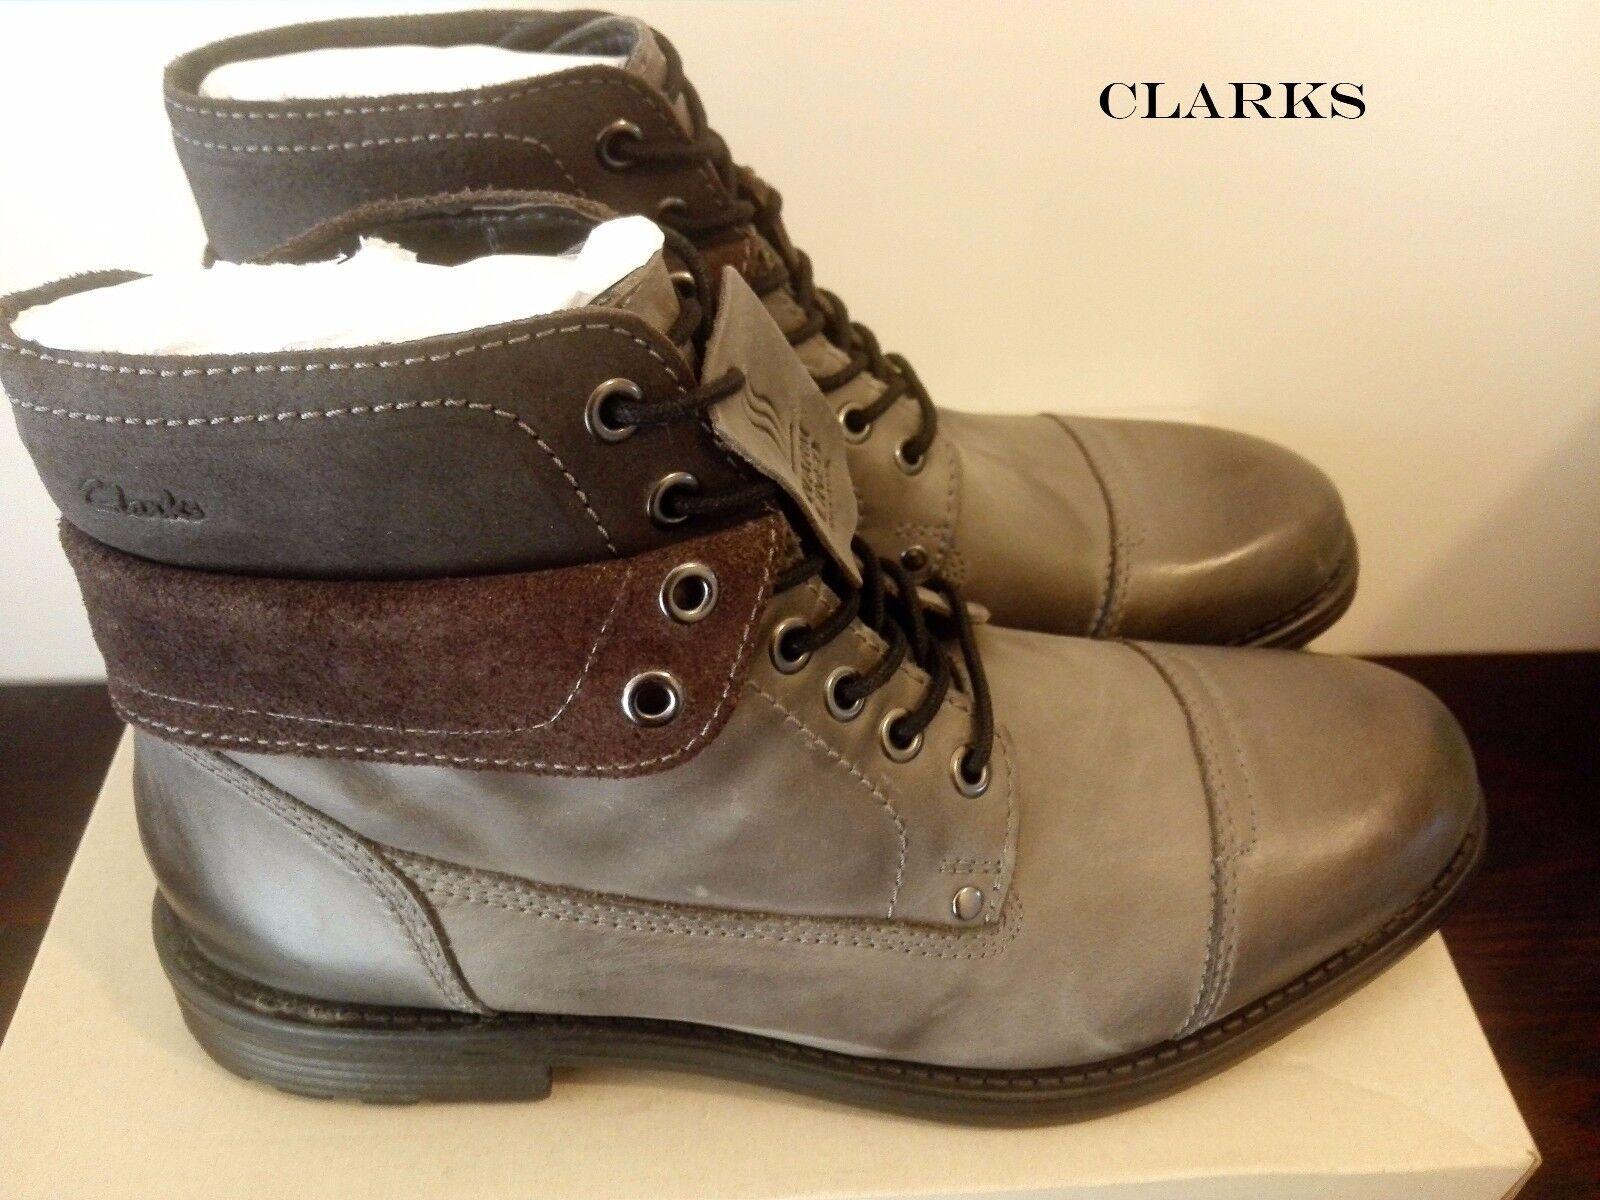 Clarks Da Uomo ** Faulkner Hi Grigio Invernali Wlined Nub ** Stivali Invernali Grigio /EU44 RRP 049da7